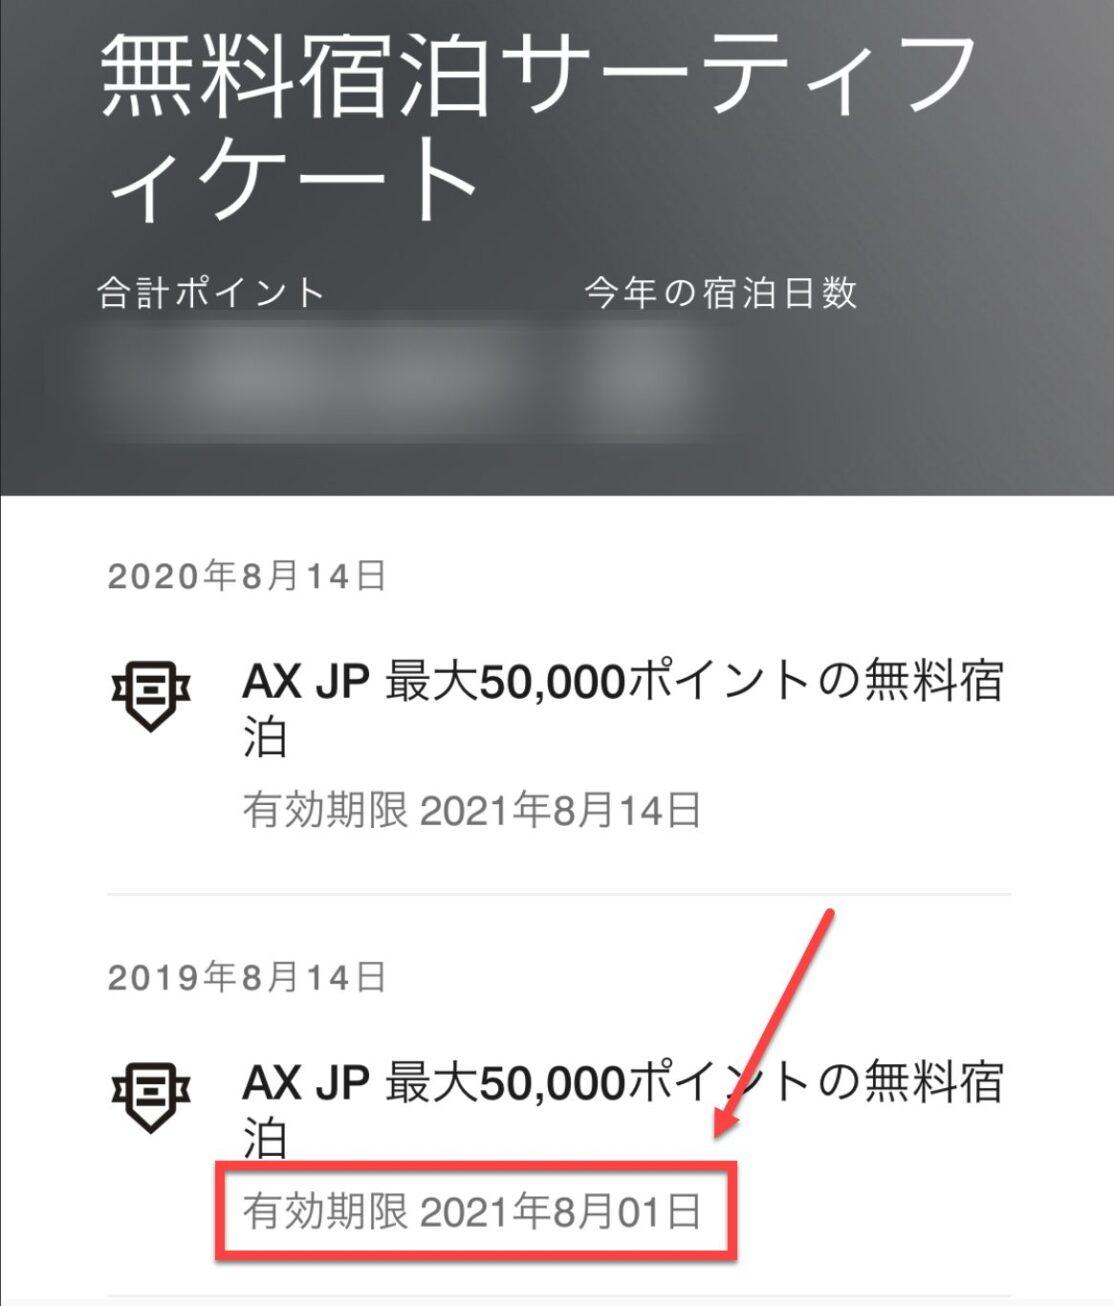 SPGアメックス無料宿泊特典延長